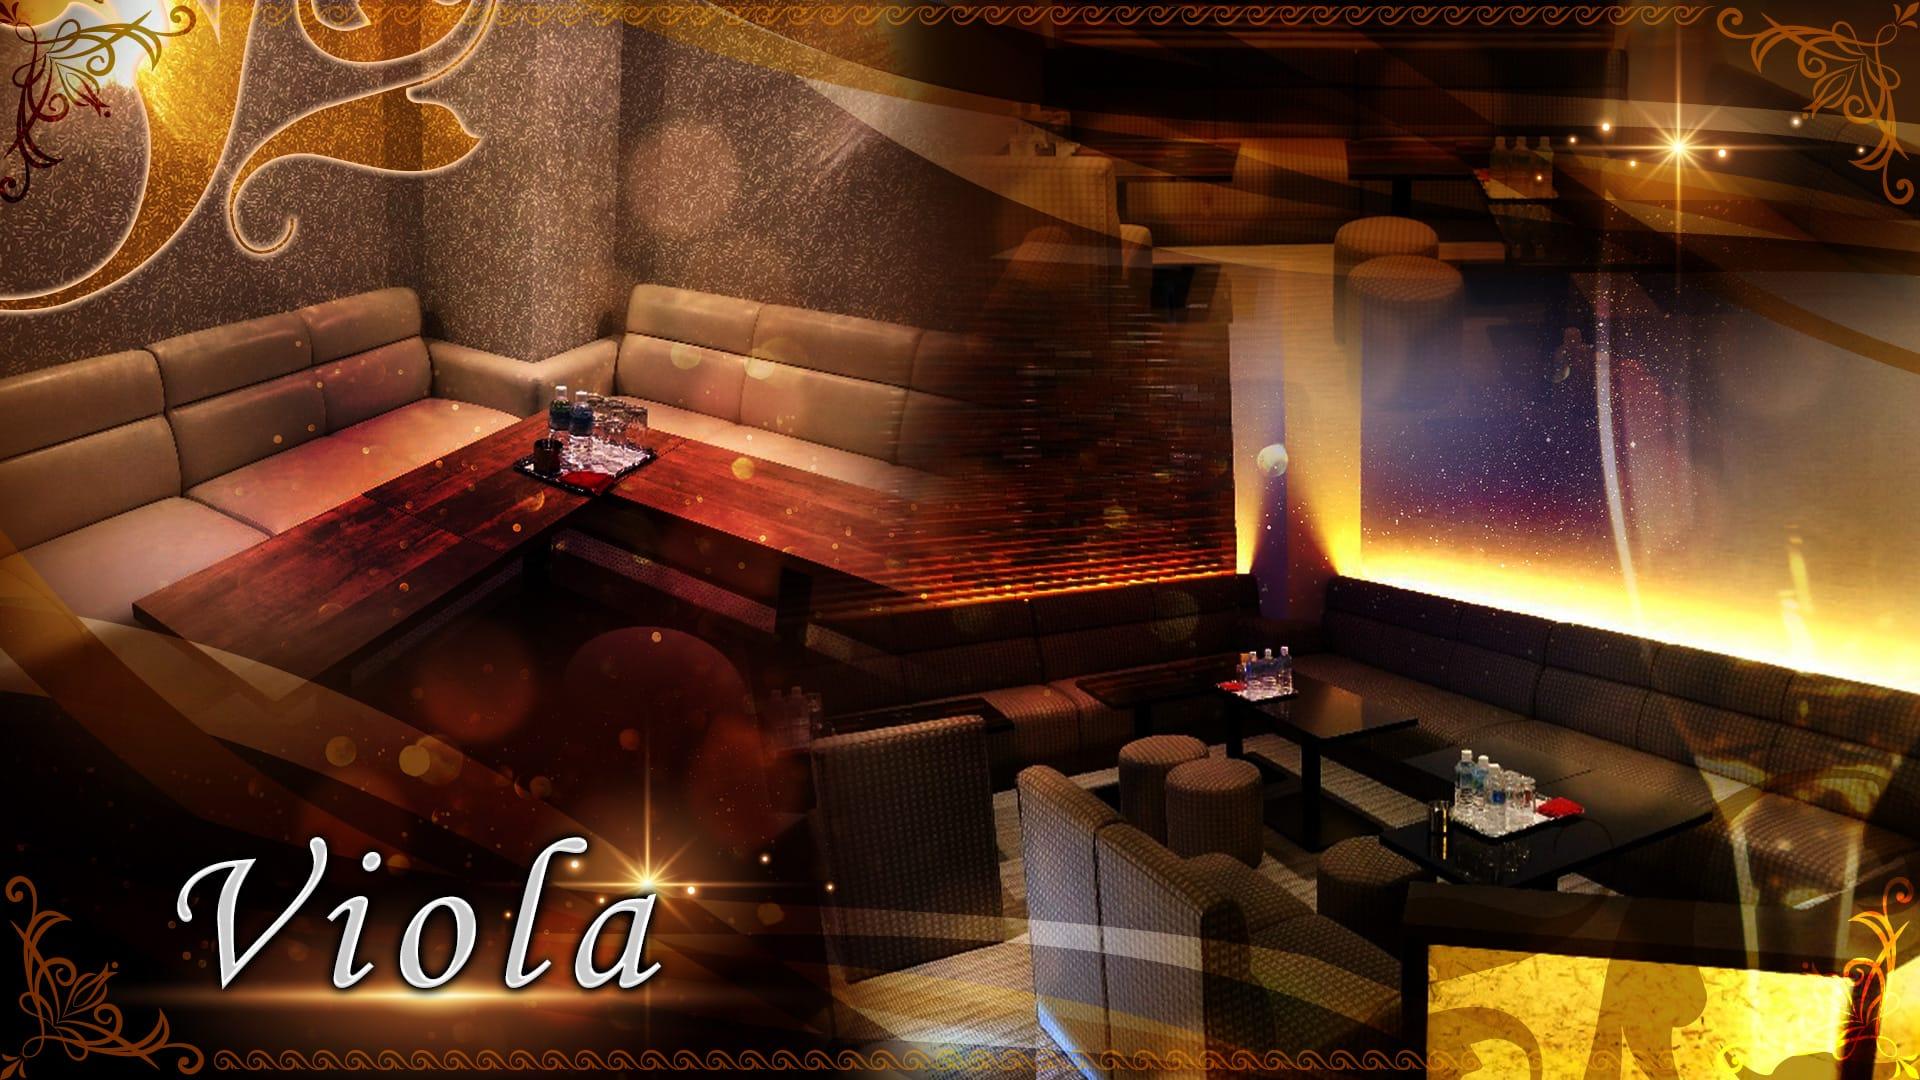 Viola(ヴィオラ) 北新地ラウンジ TOP画像